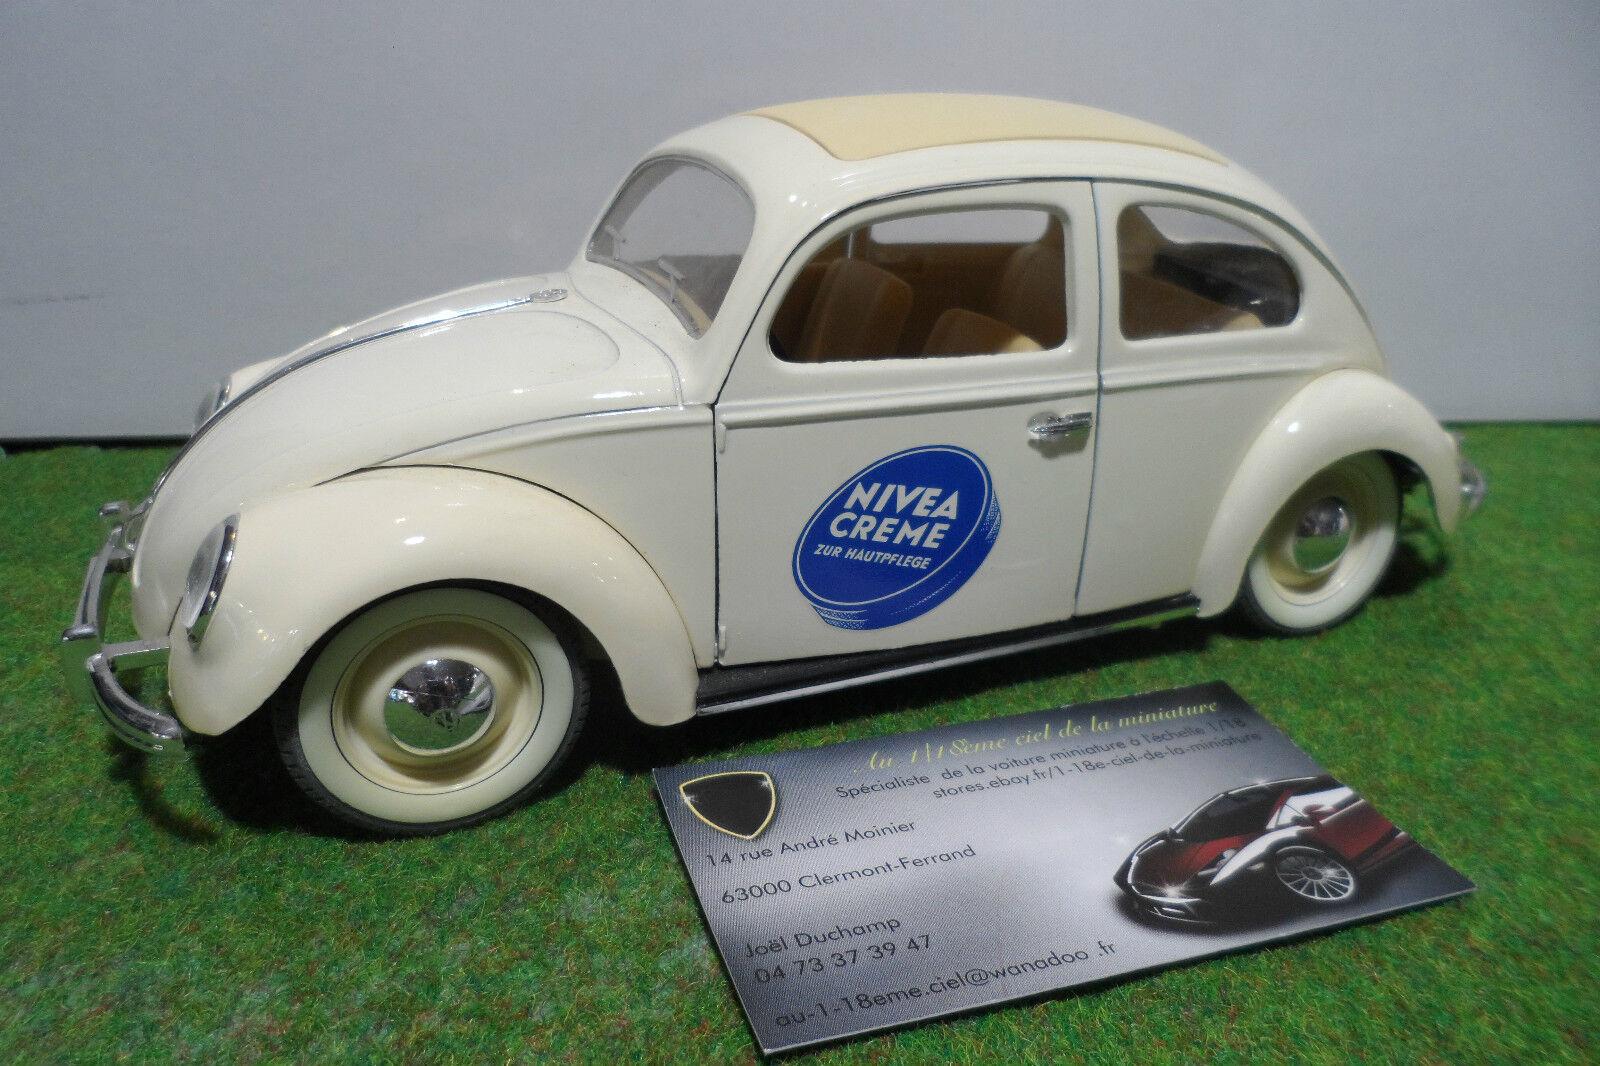 VOLKSWAGEN COCCINELLE NIVEA Crème ZUR HAUTPFLEGE 1 18 SOLIDO voiture miniature